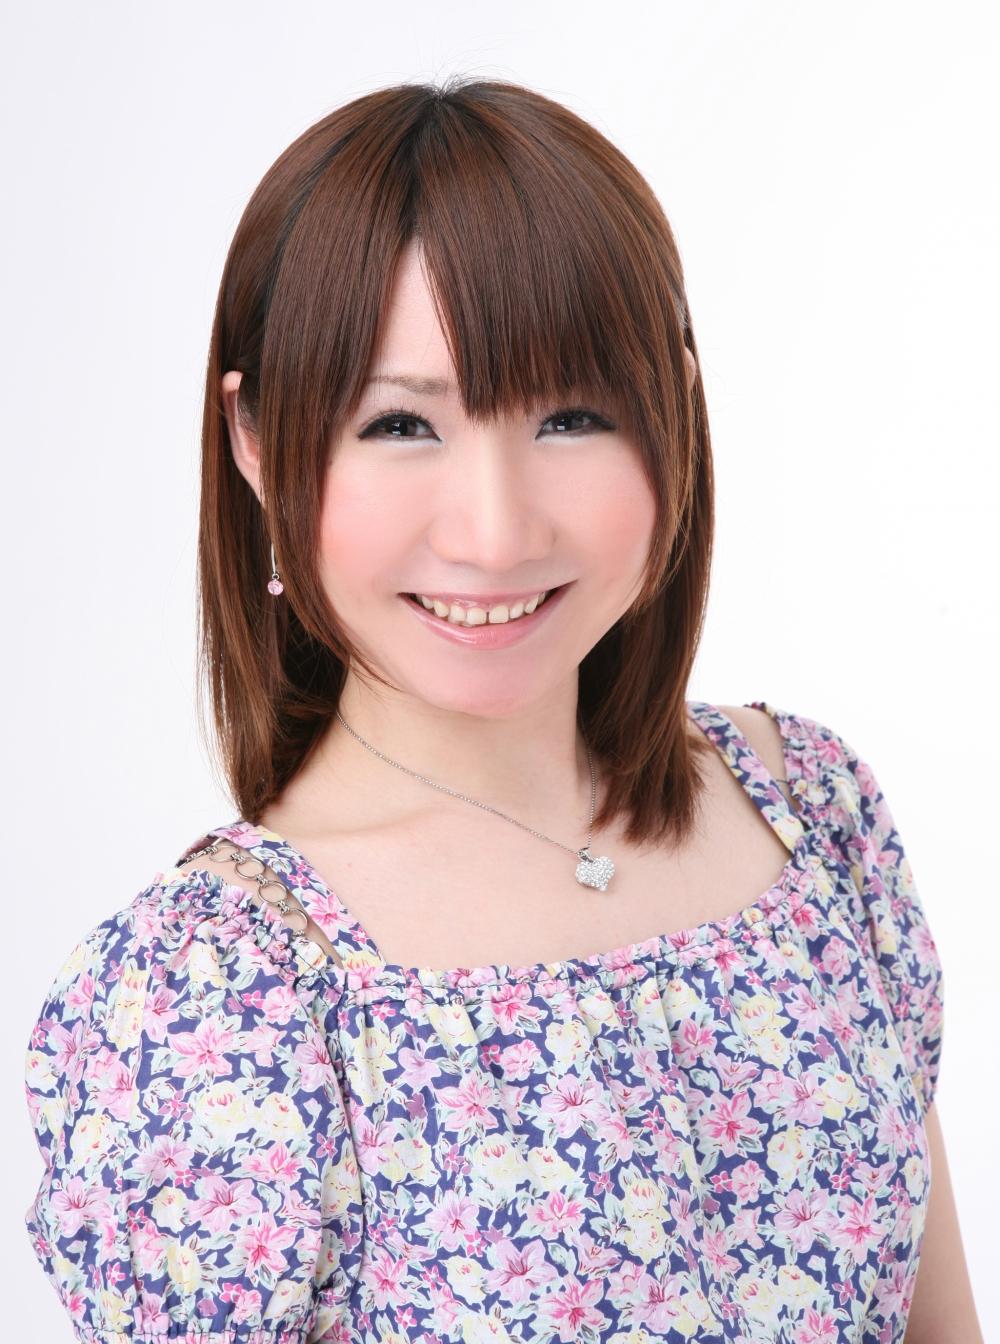 File:SakuraYoshioka.png